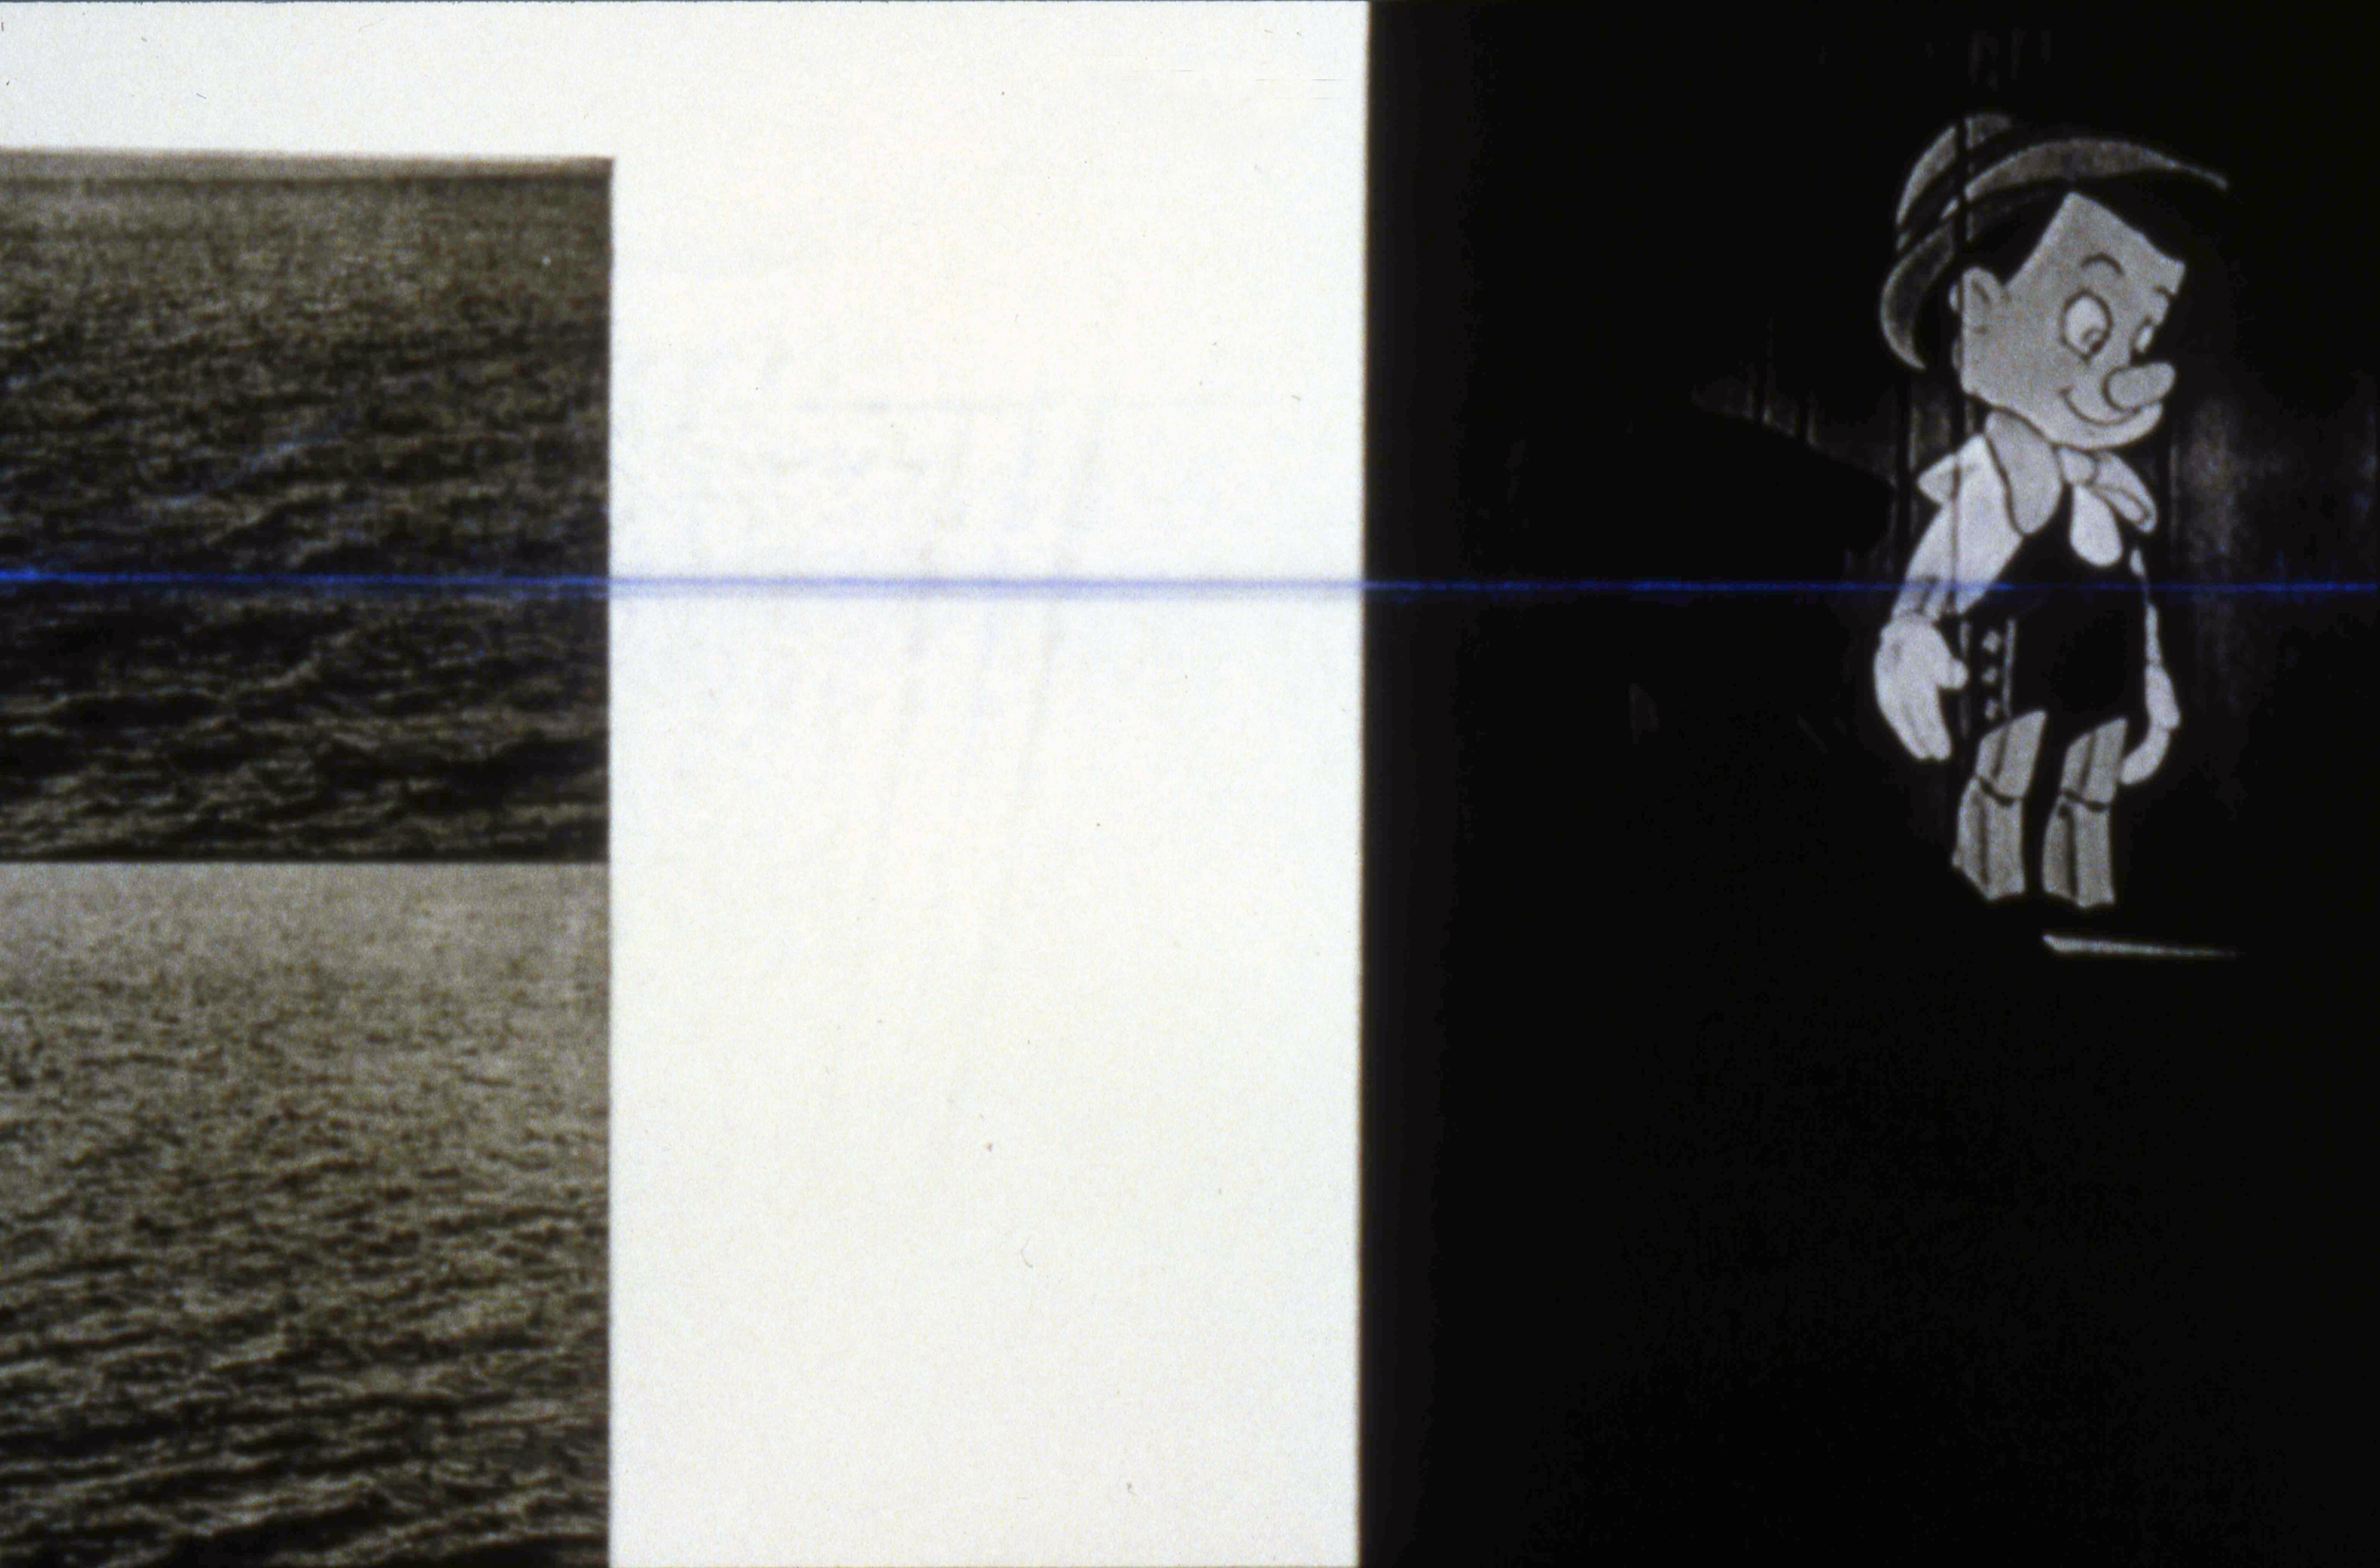 untitled, 1997, Photo Gravure with Chalkline on Plexi, detail